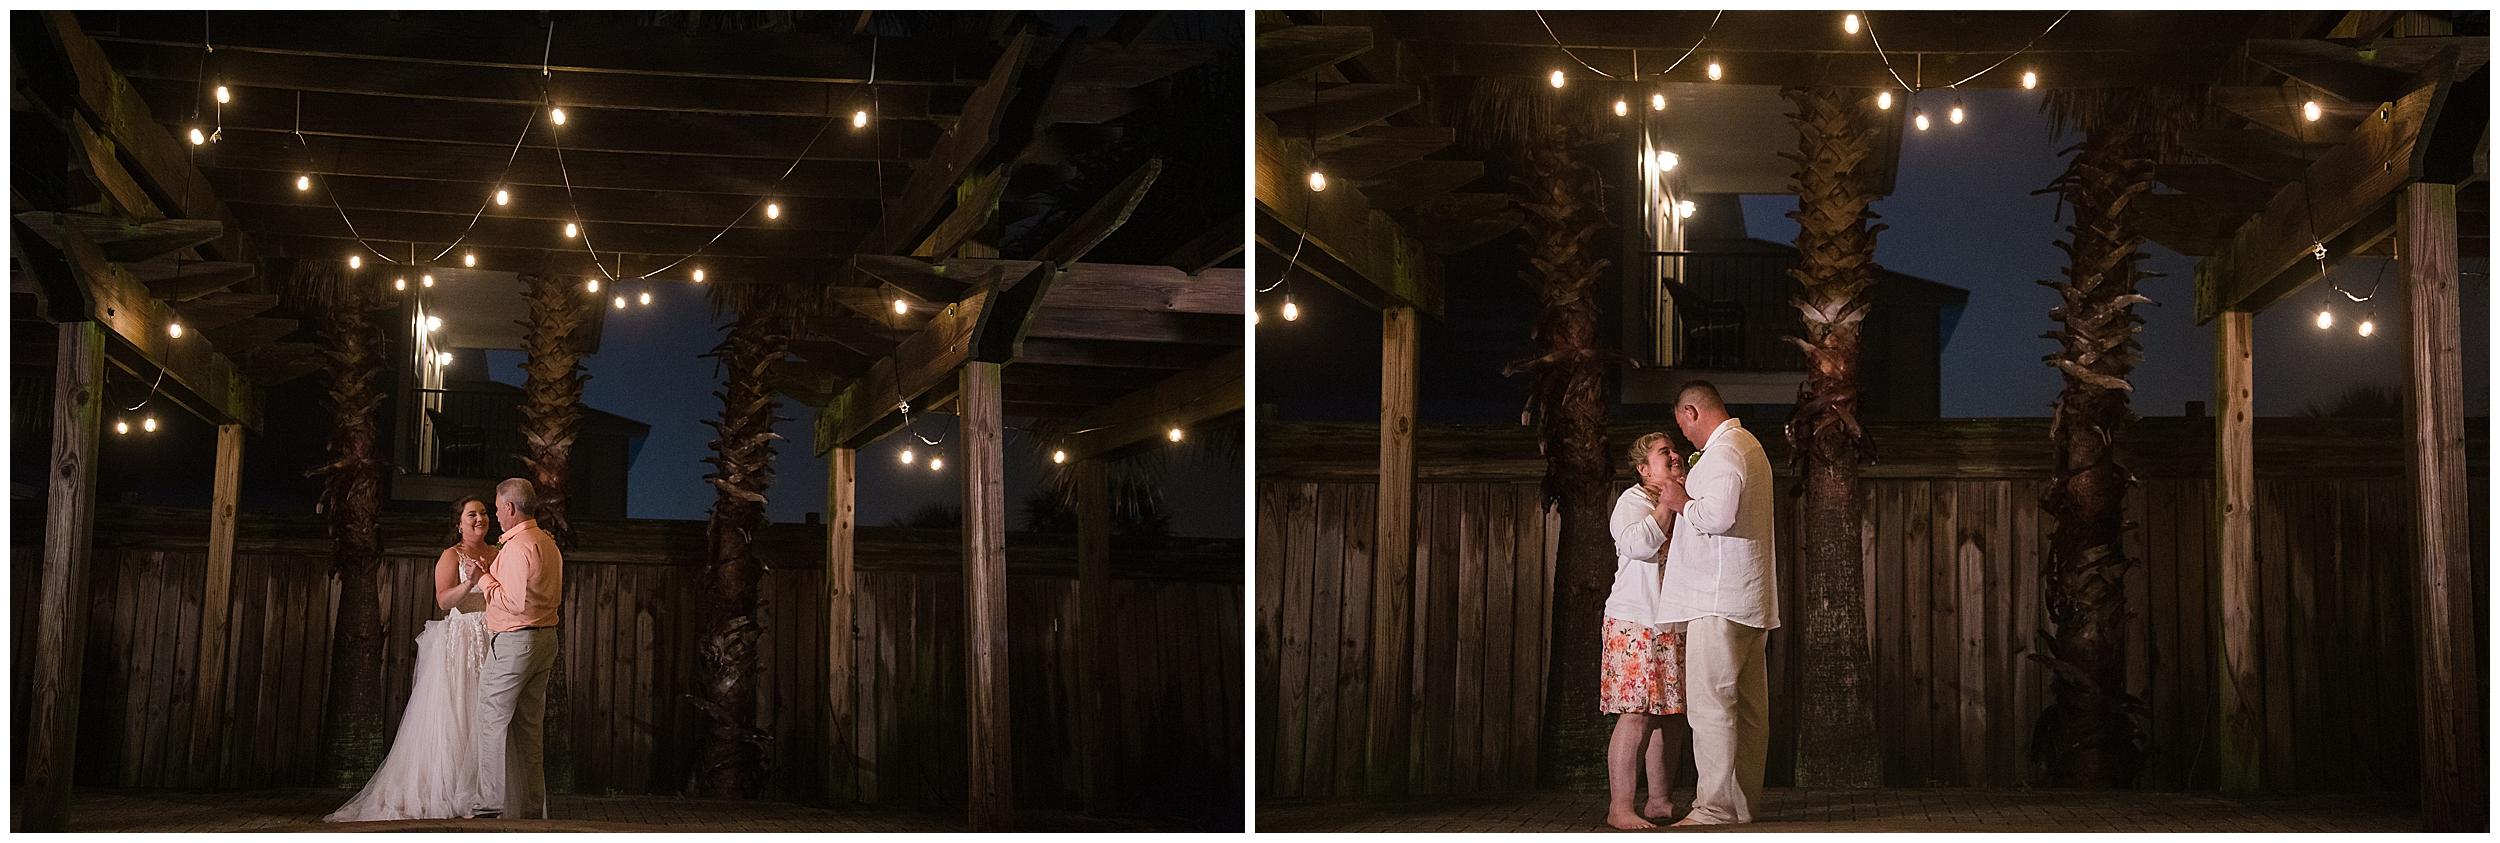 30a-Destin-Florida-Wedding-Photography-Jennie-Jeremy_0044.jpg